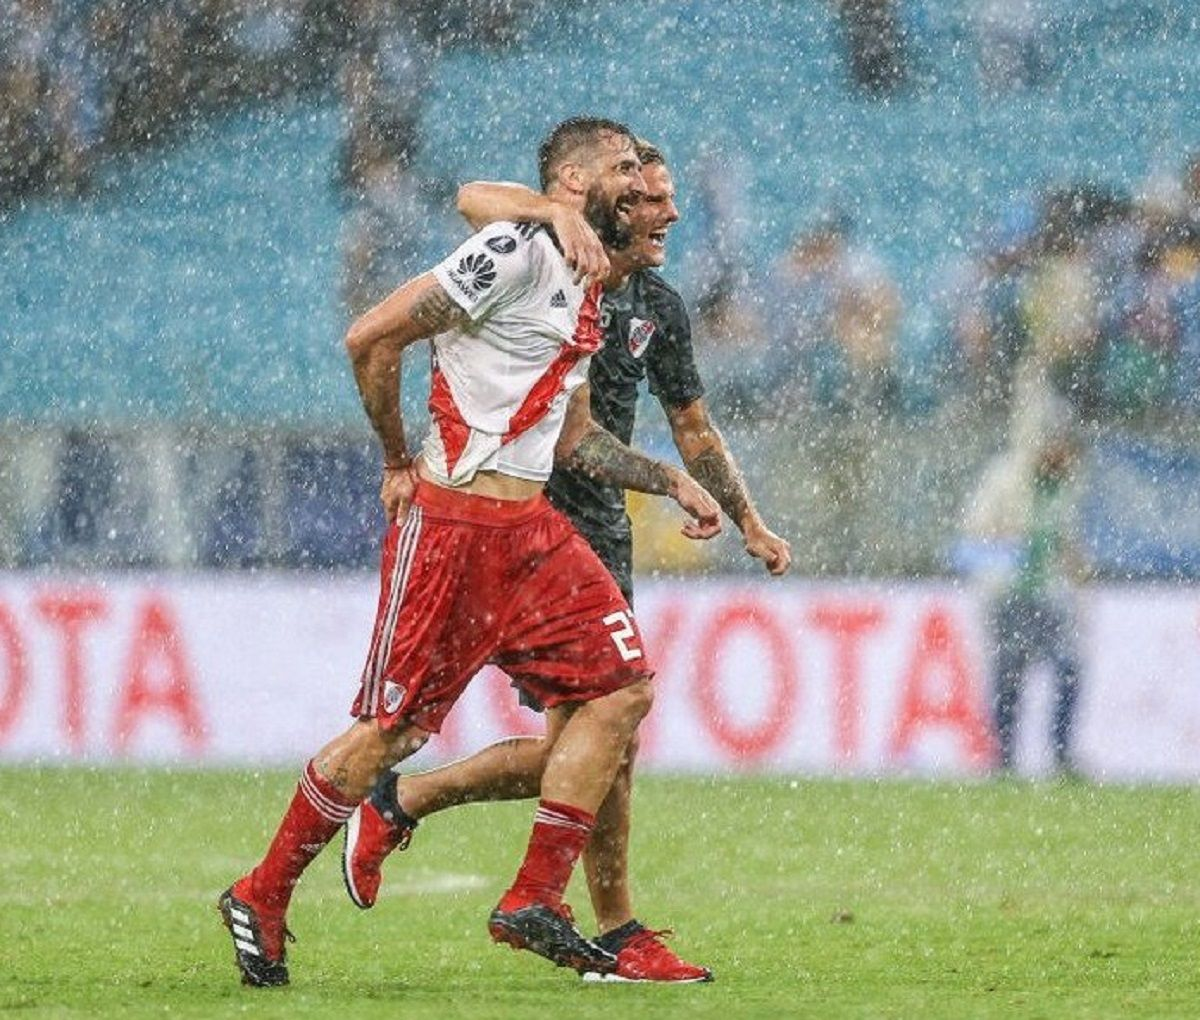 El Oso festeja junto a Bruno Zuculini